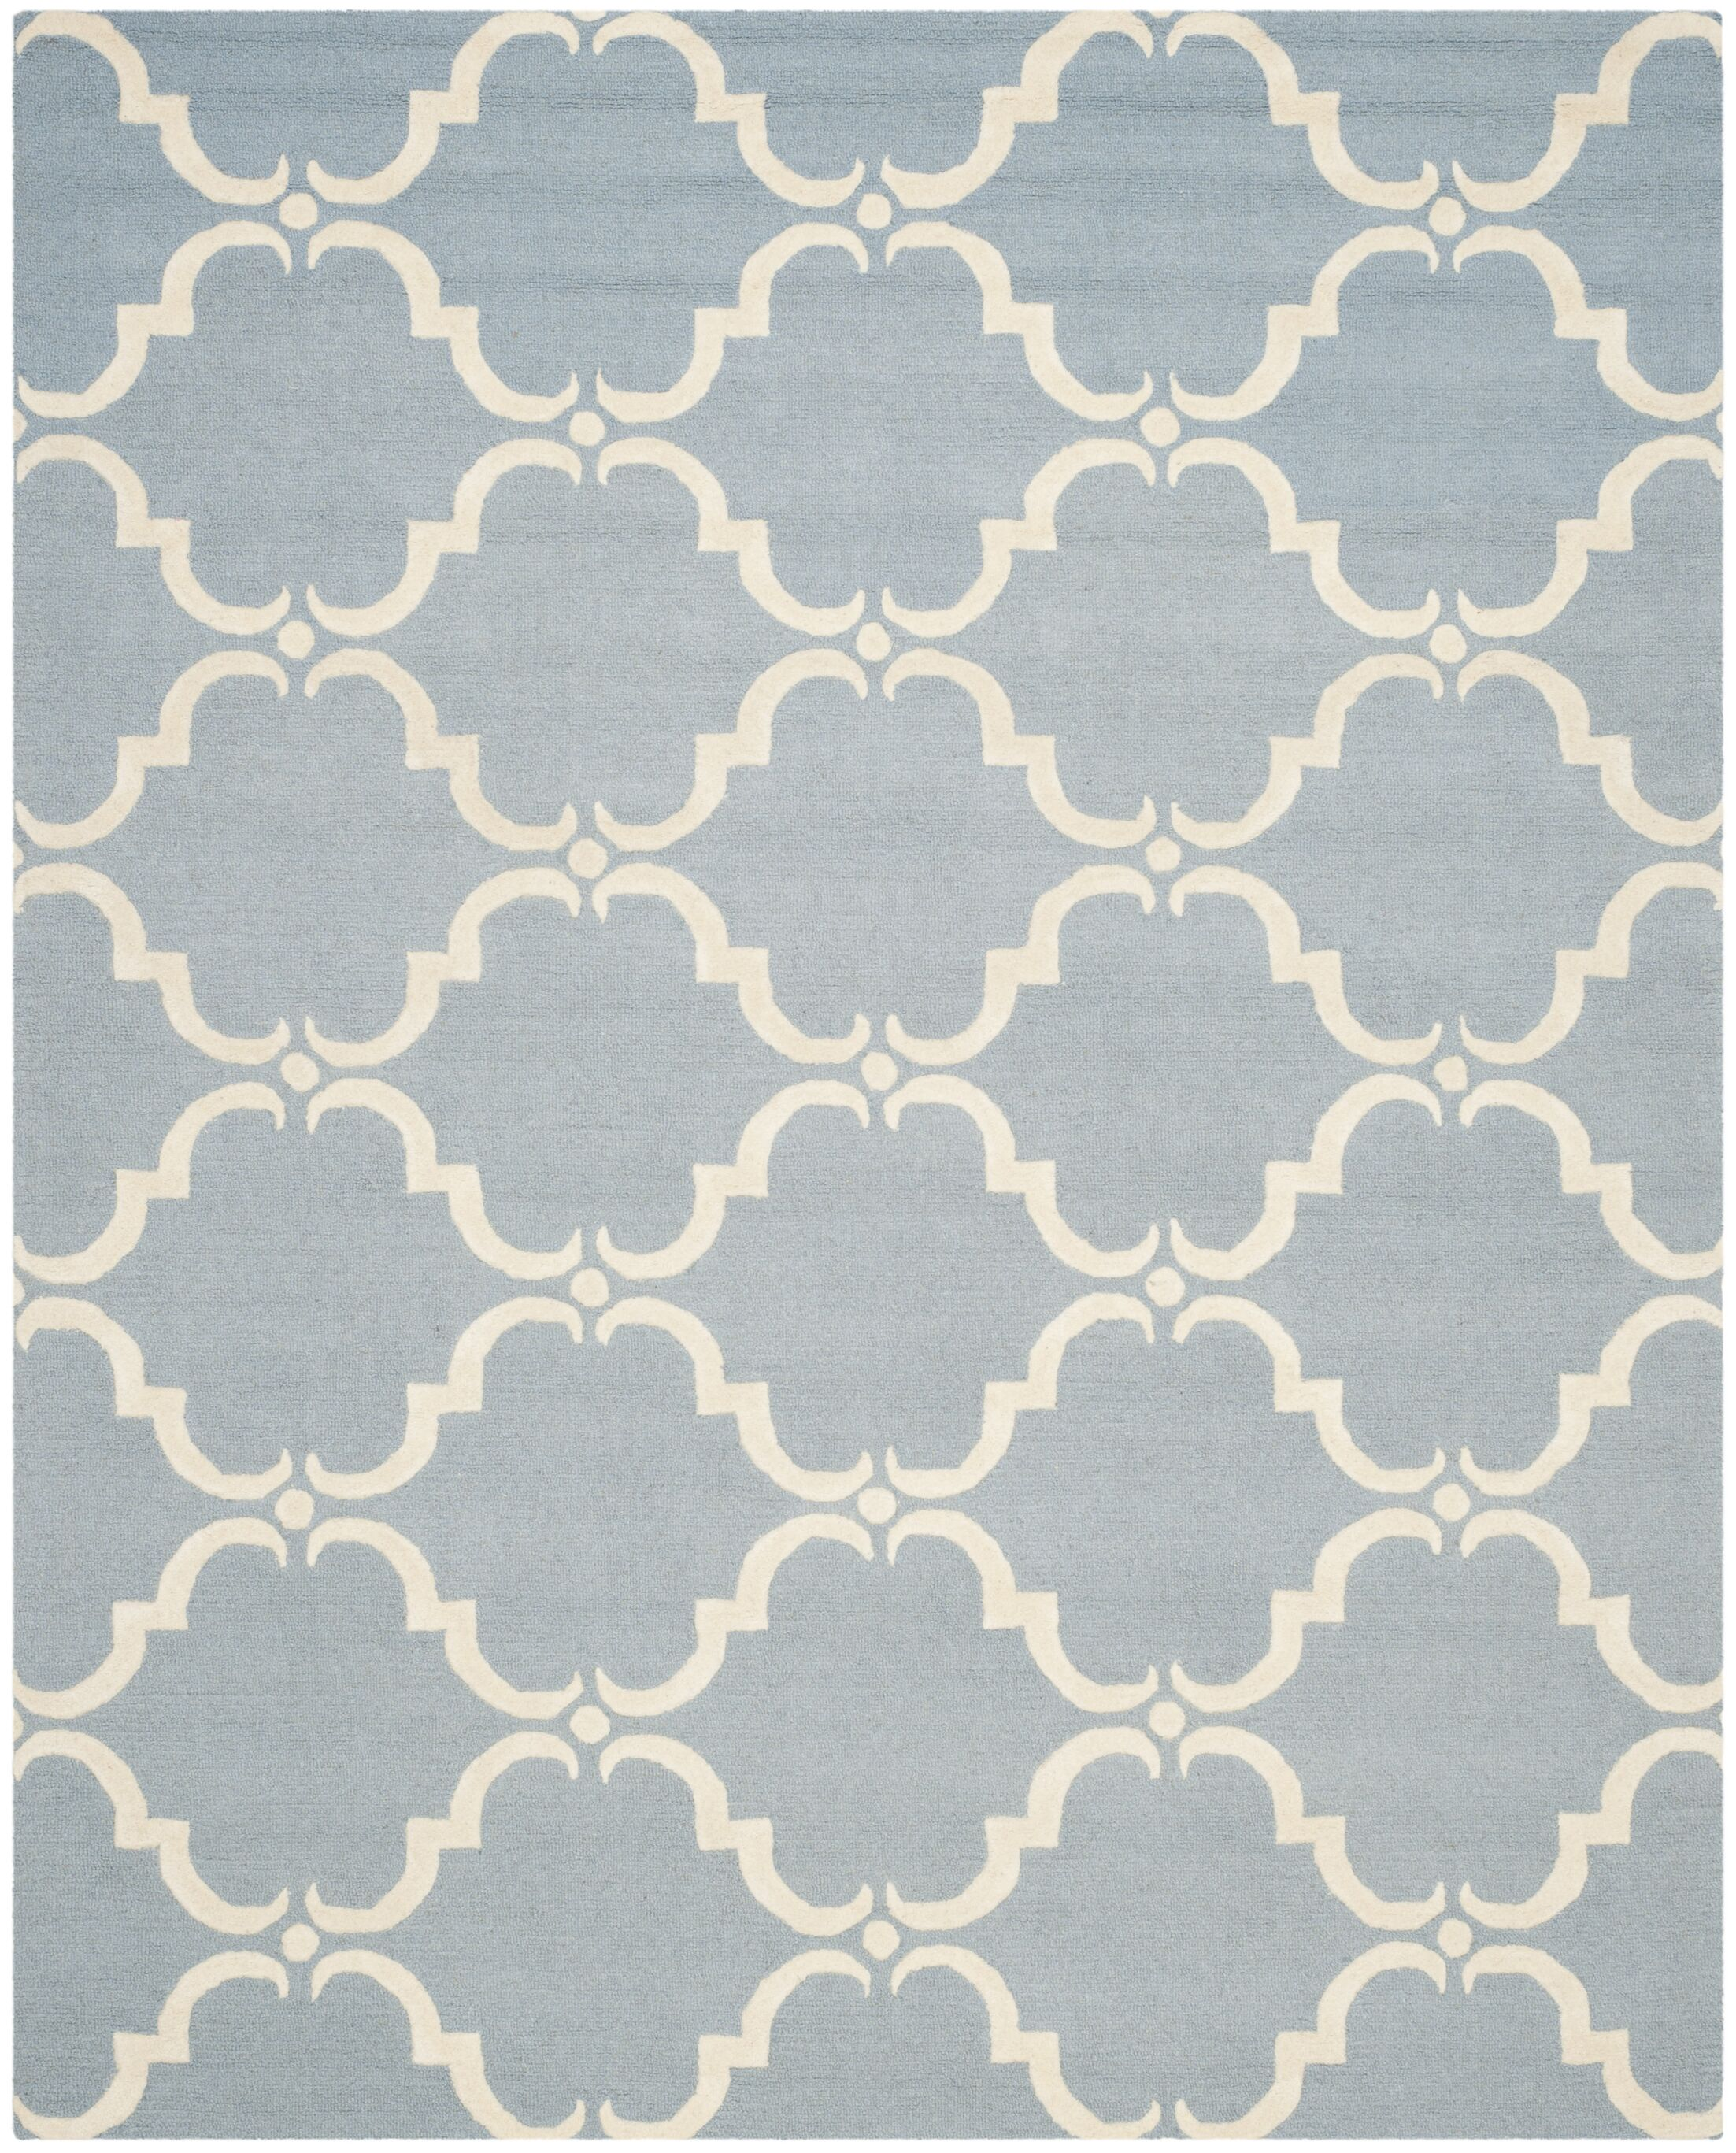 Cambridge Tufted Wool Blue/Ivory Area Rug Rug Size: Rectangle 8' x 10'